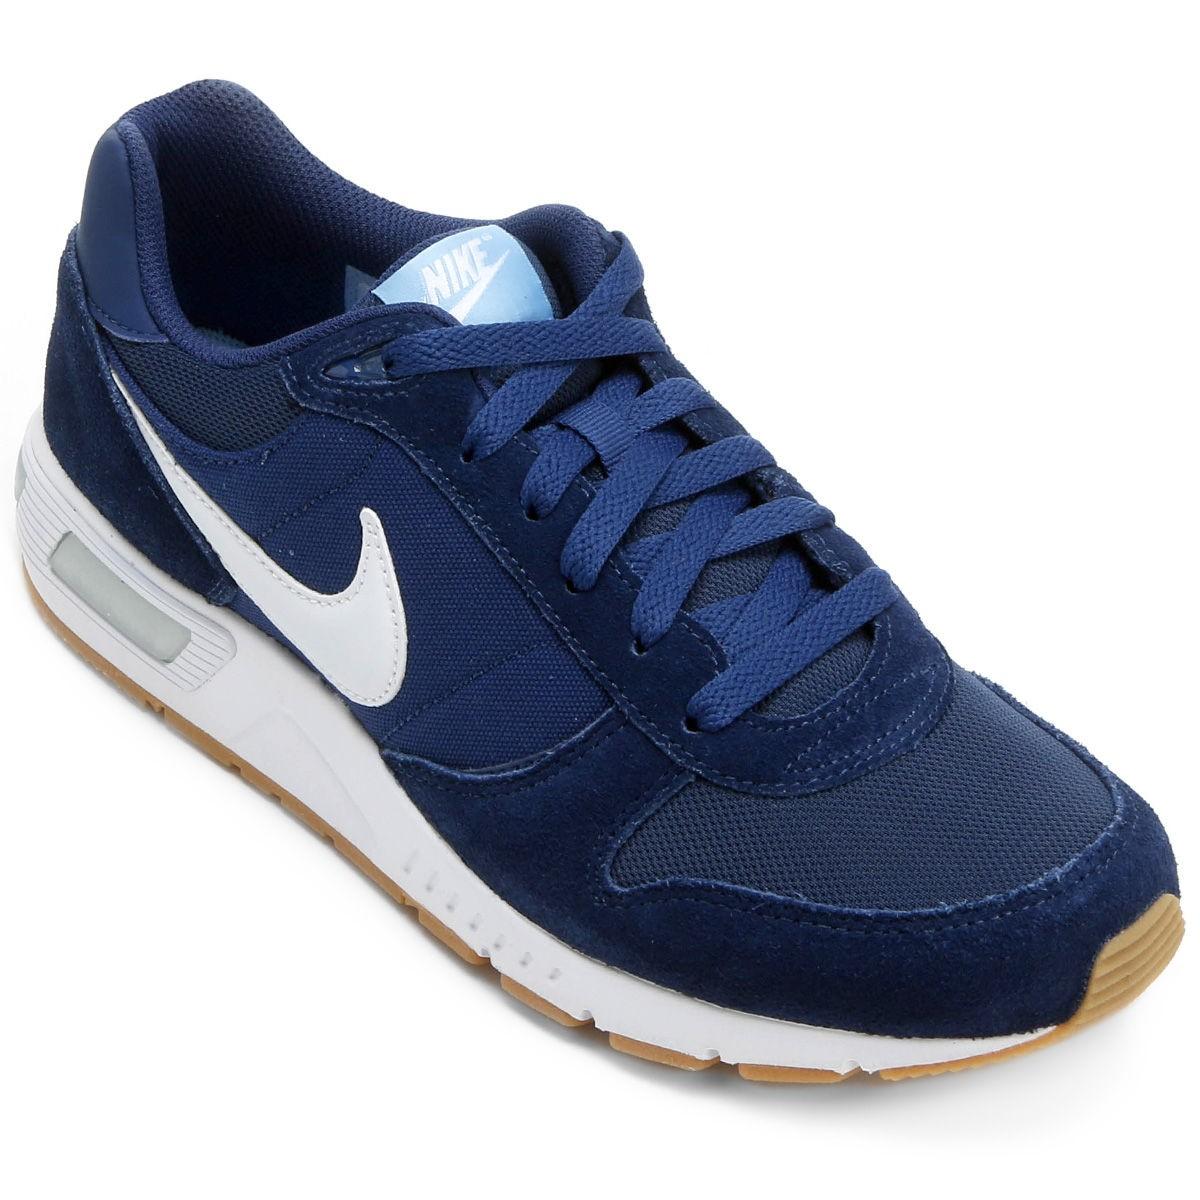 Tênis Nike Nightgazer LW Masculino - Azul Royal